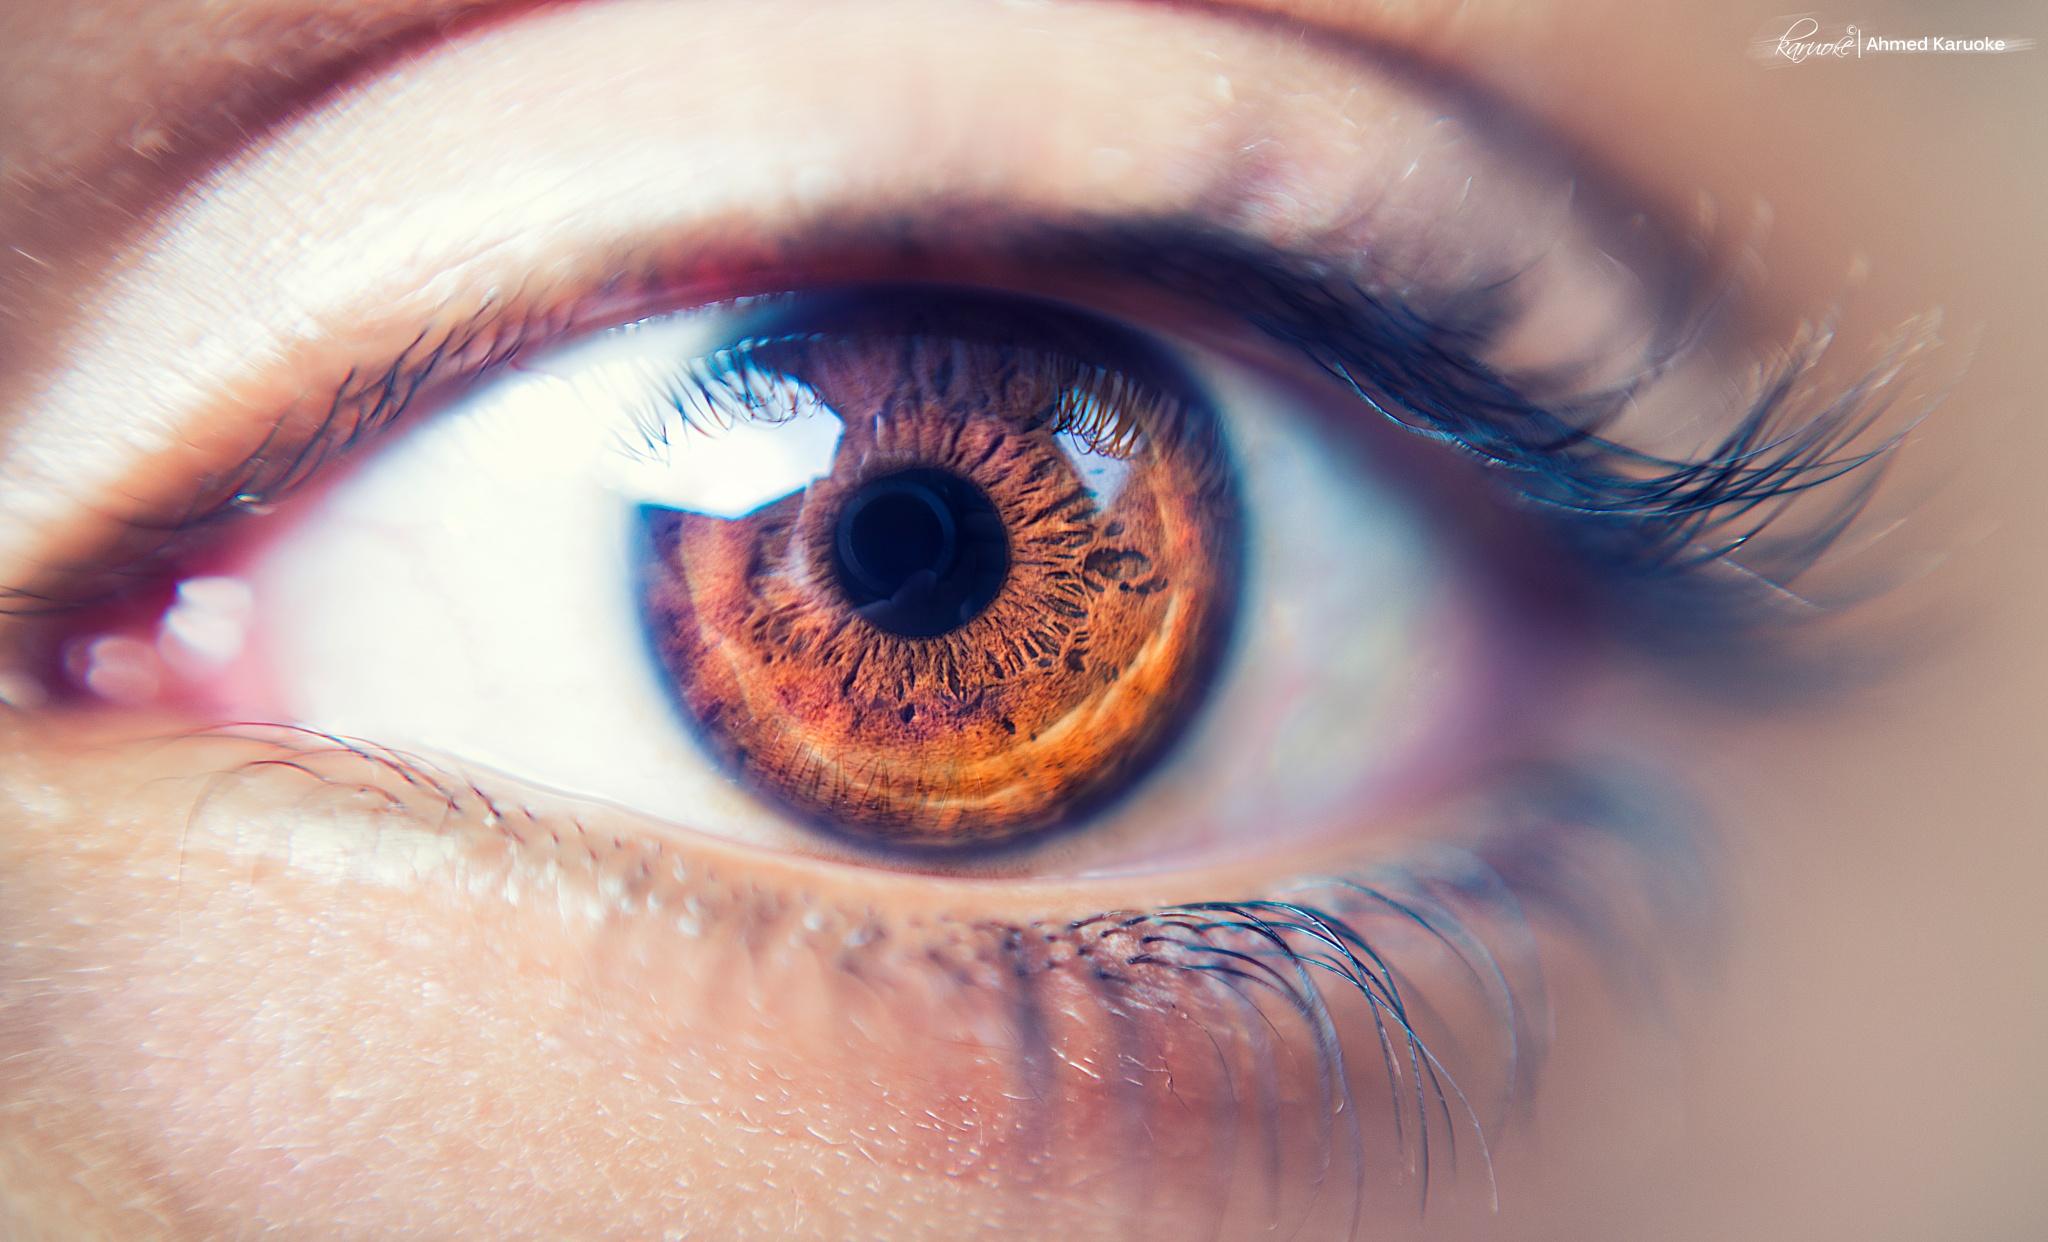 Macro Eye  by Ahmed Karuoke